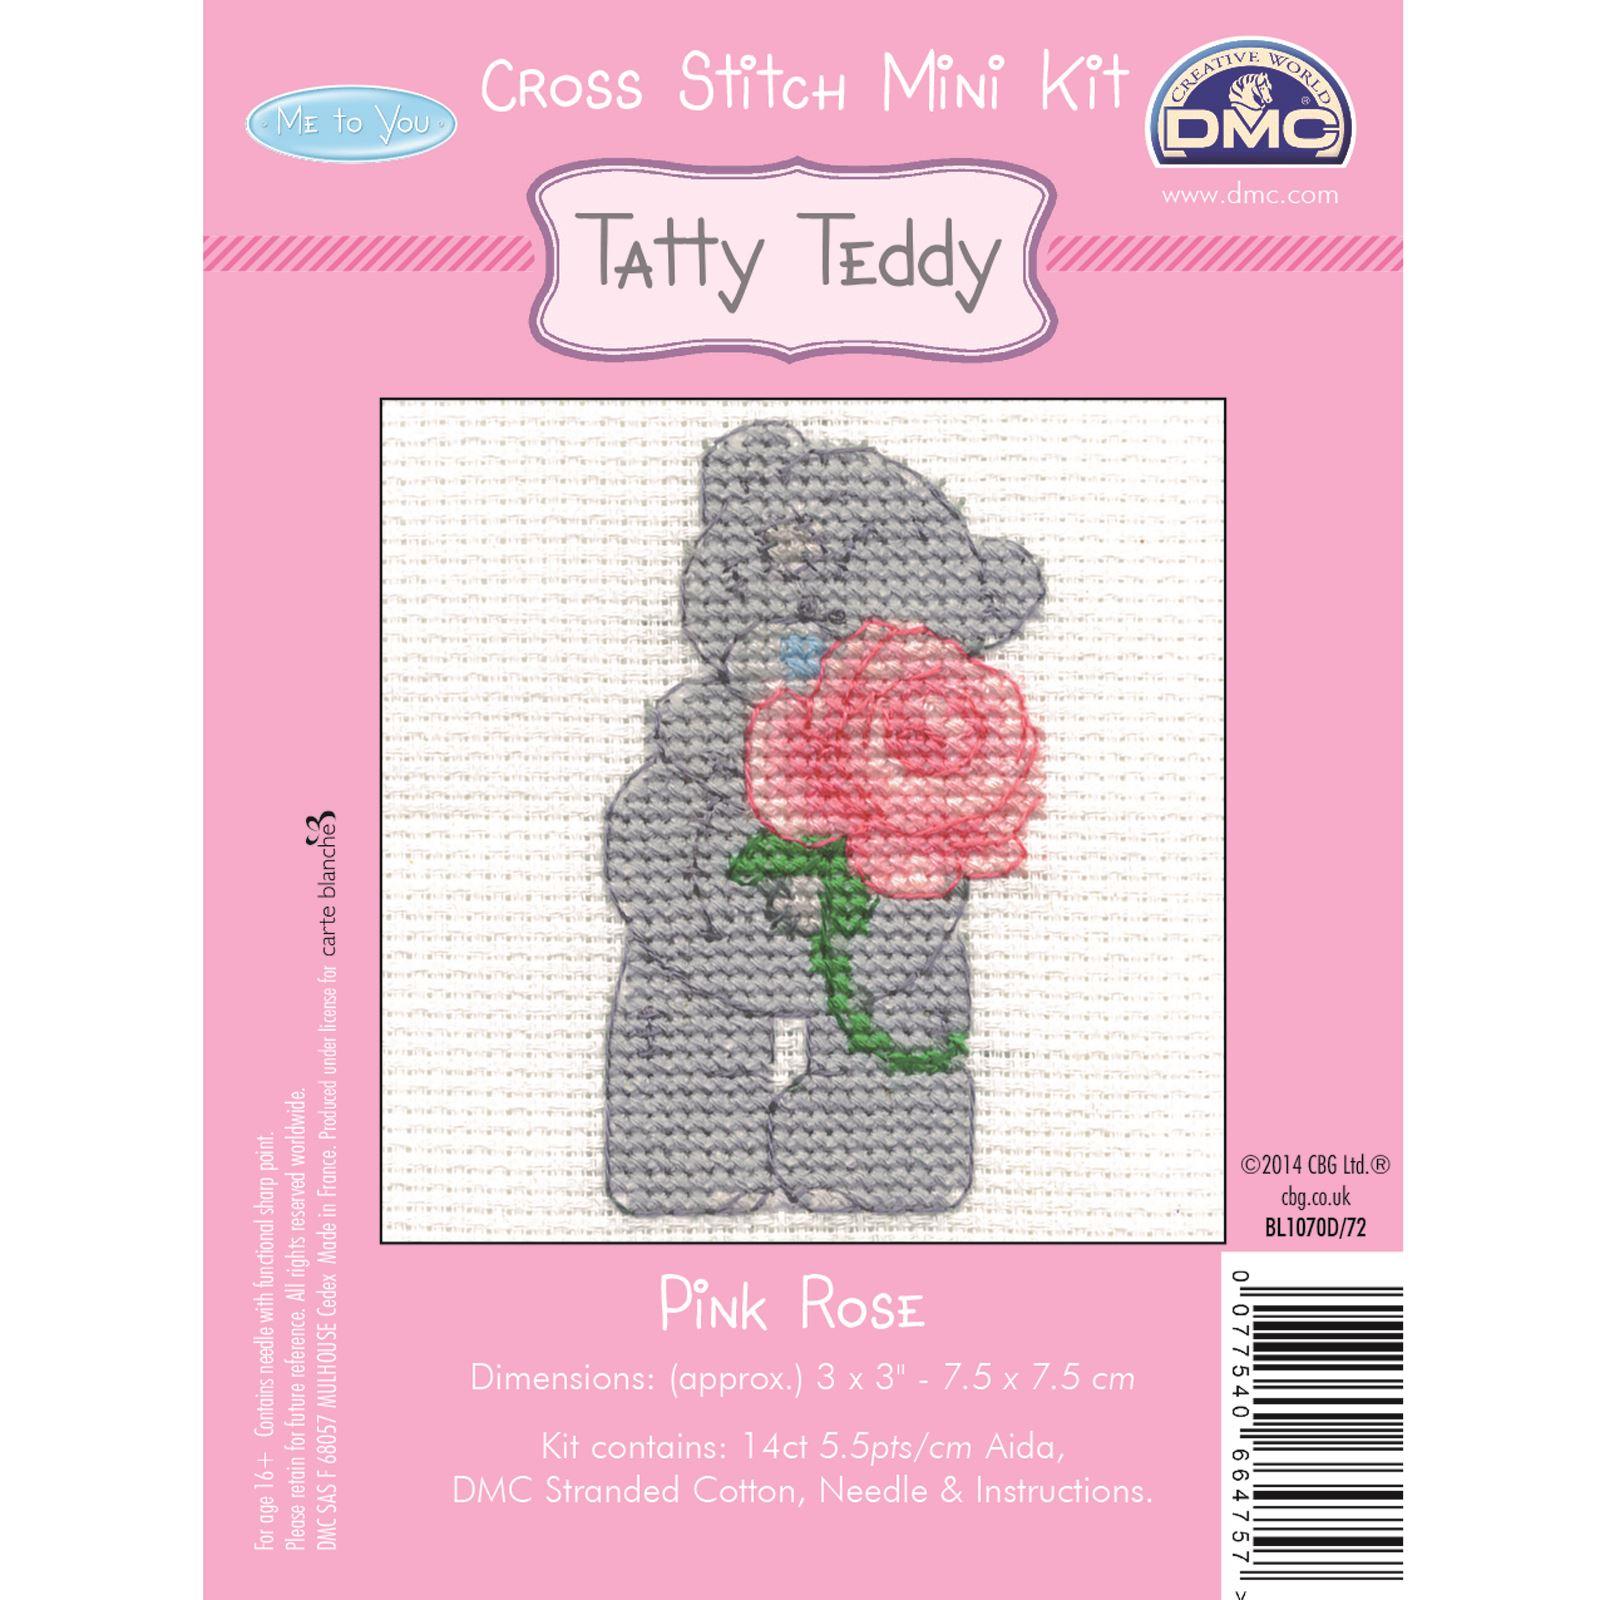 DMC-Mini-Cross-Stitch-Kit-Me-to-You-Tatty-Teddy-8-Designs thumbnail 11